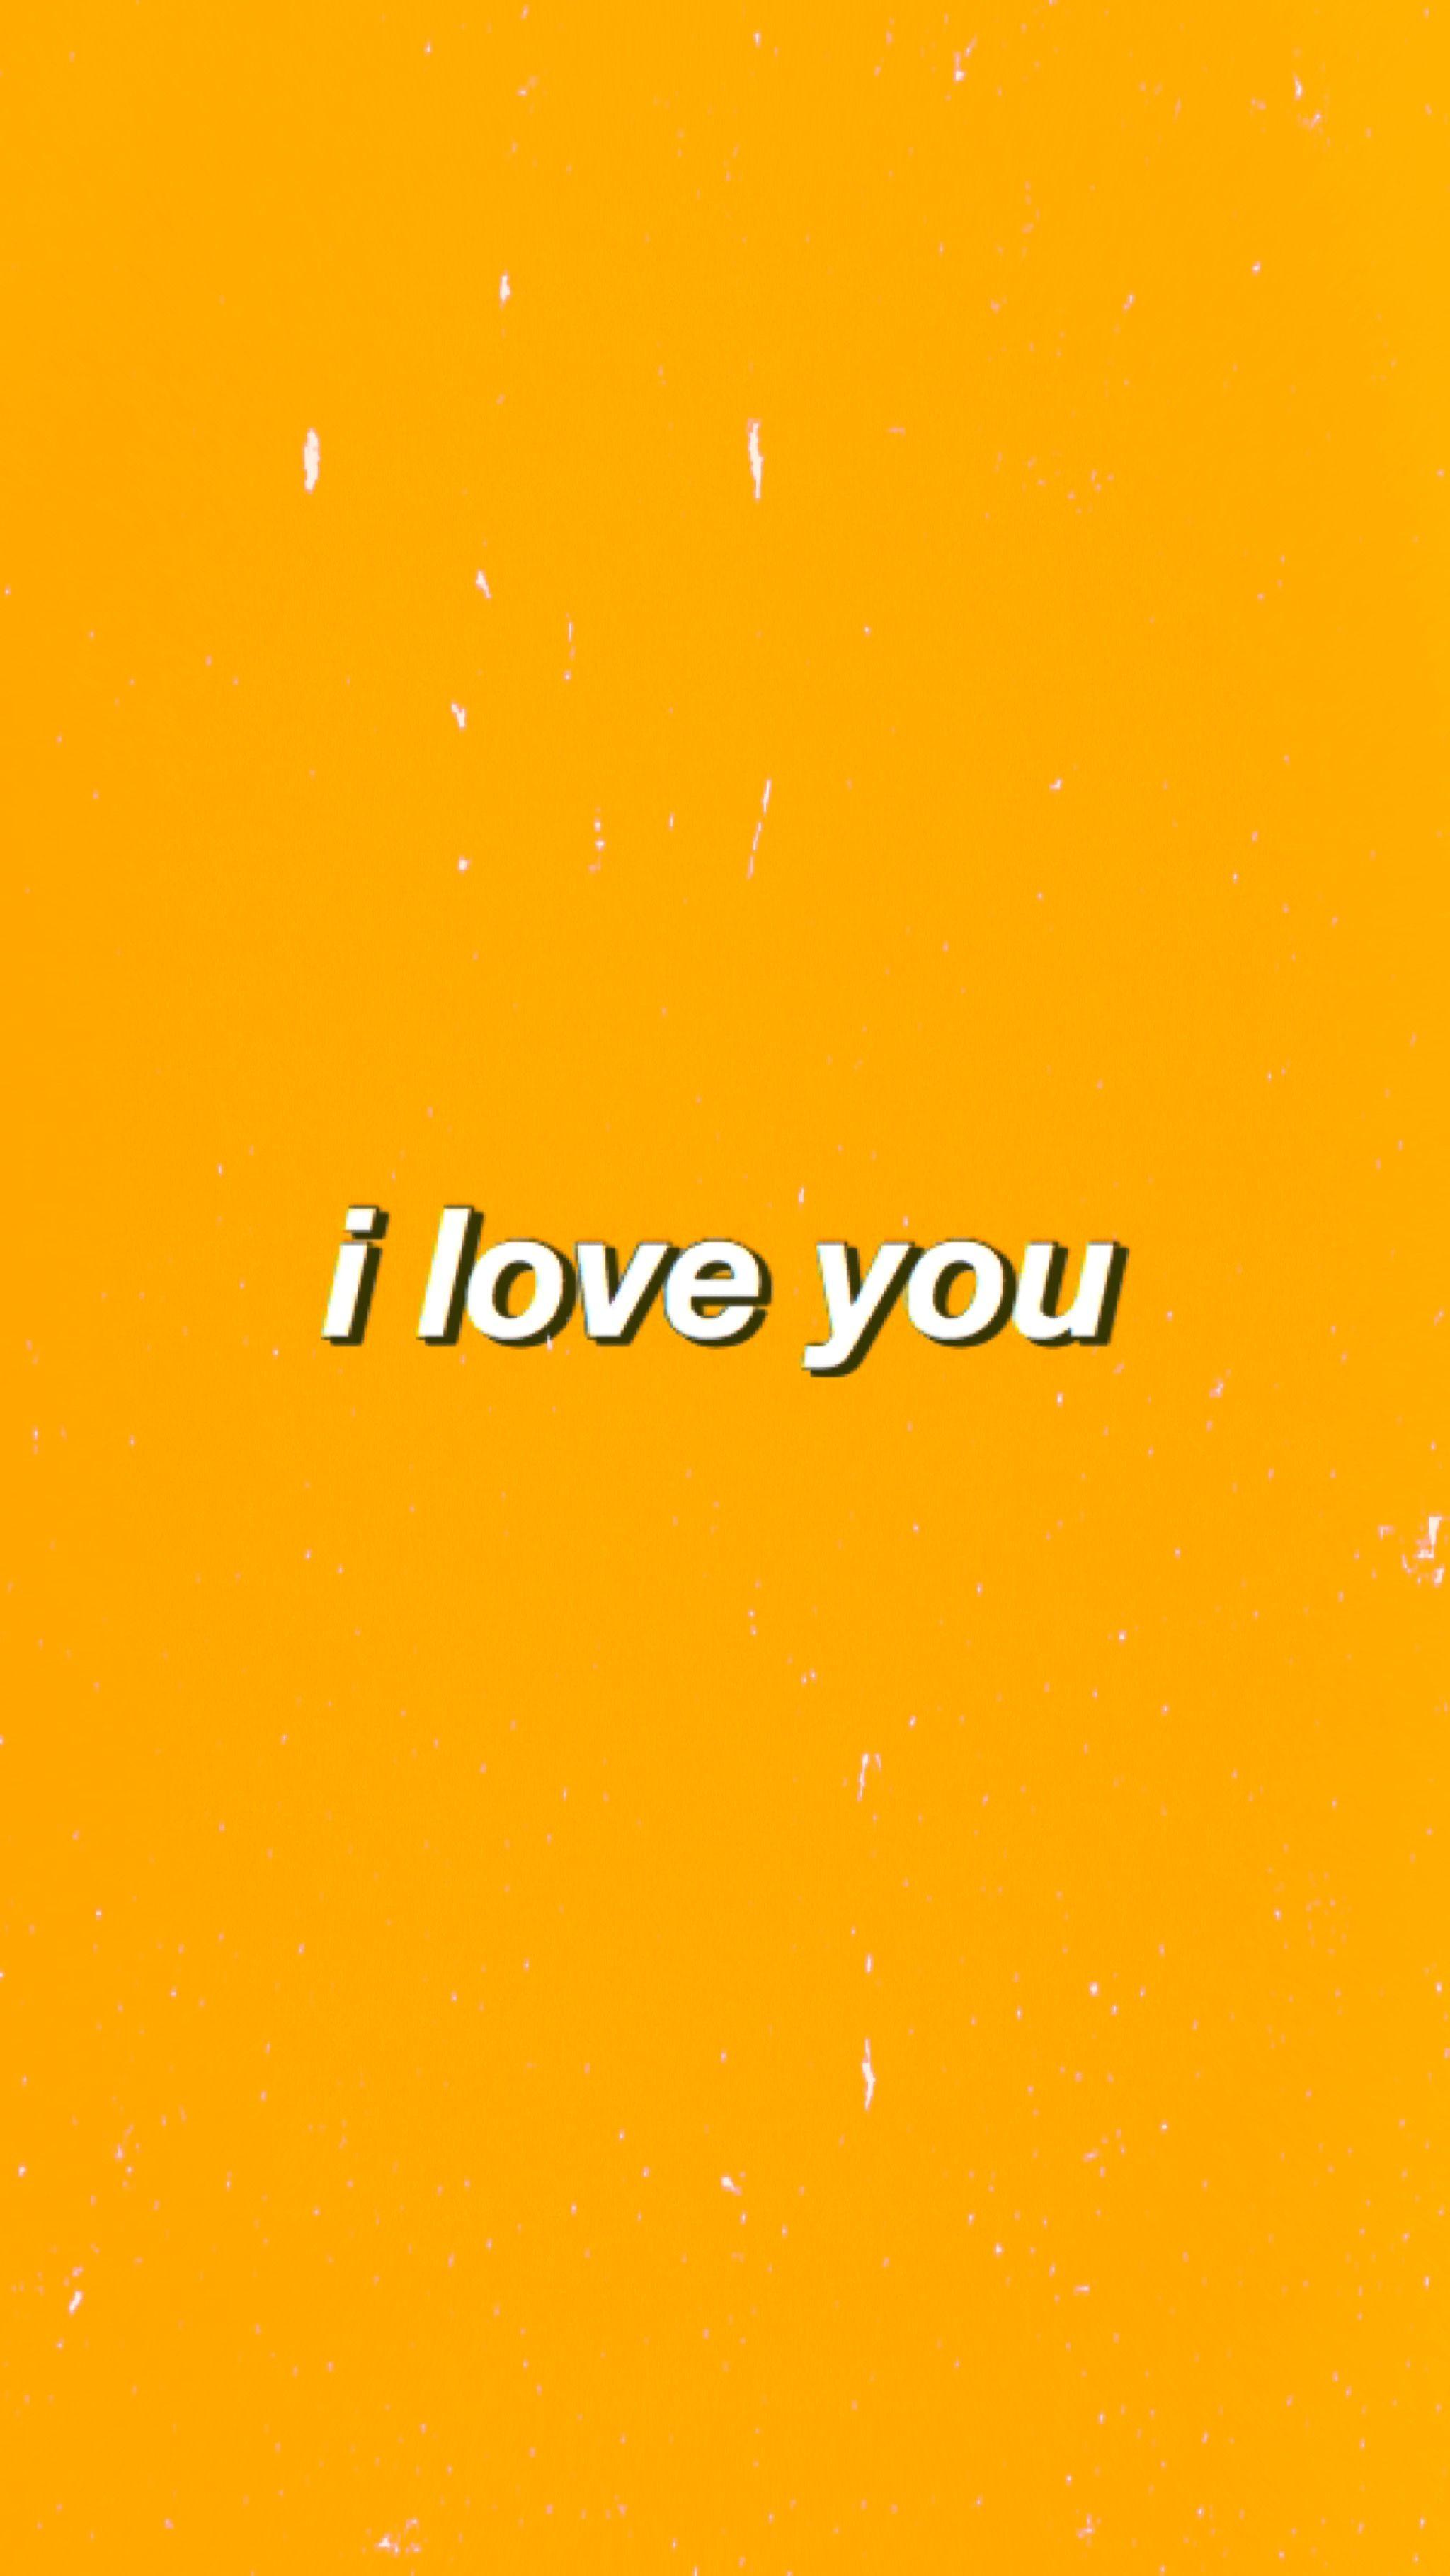 orange aesthetic background first post 🍊 Aesthetic